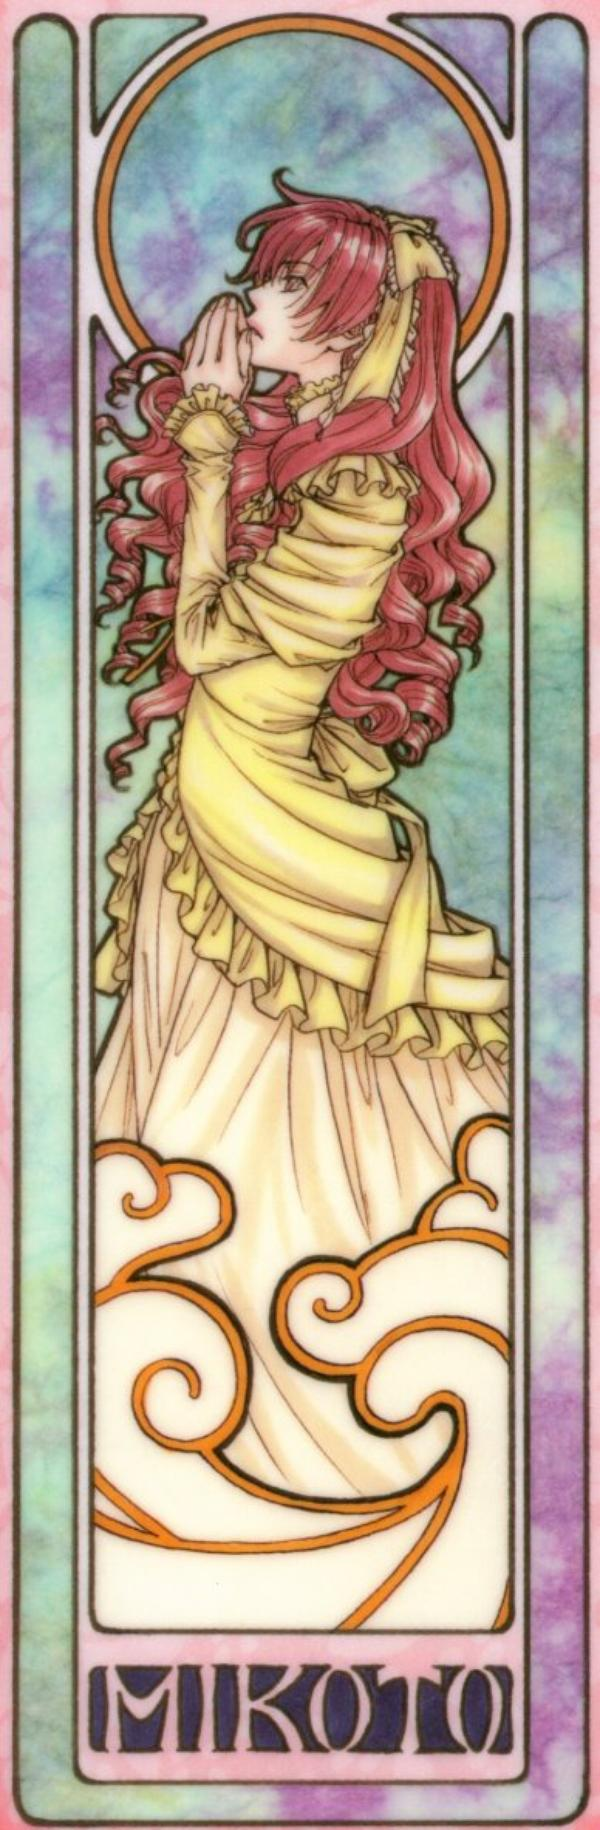 ♥ Princess Princess --> Mikoto, Tohru, Yujirou ♥